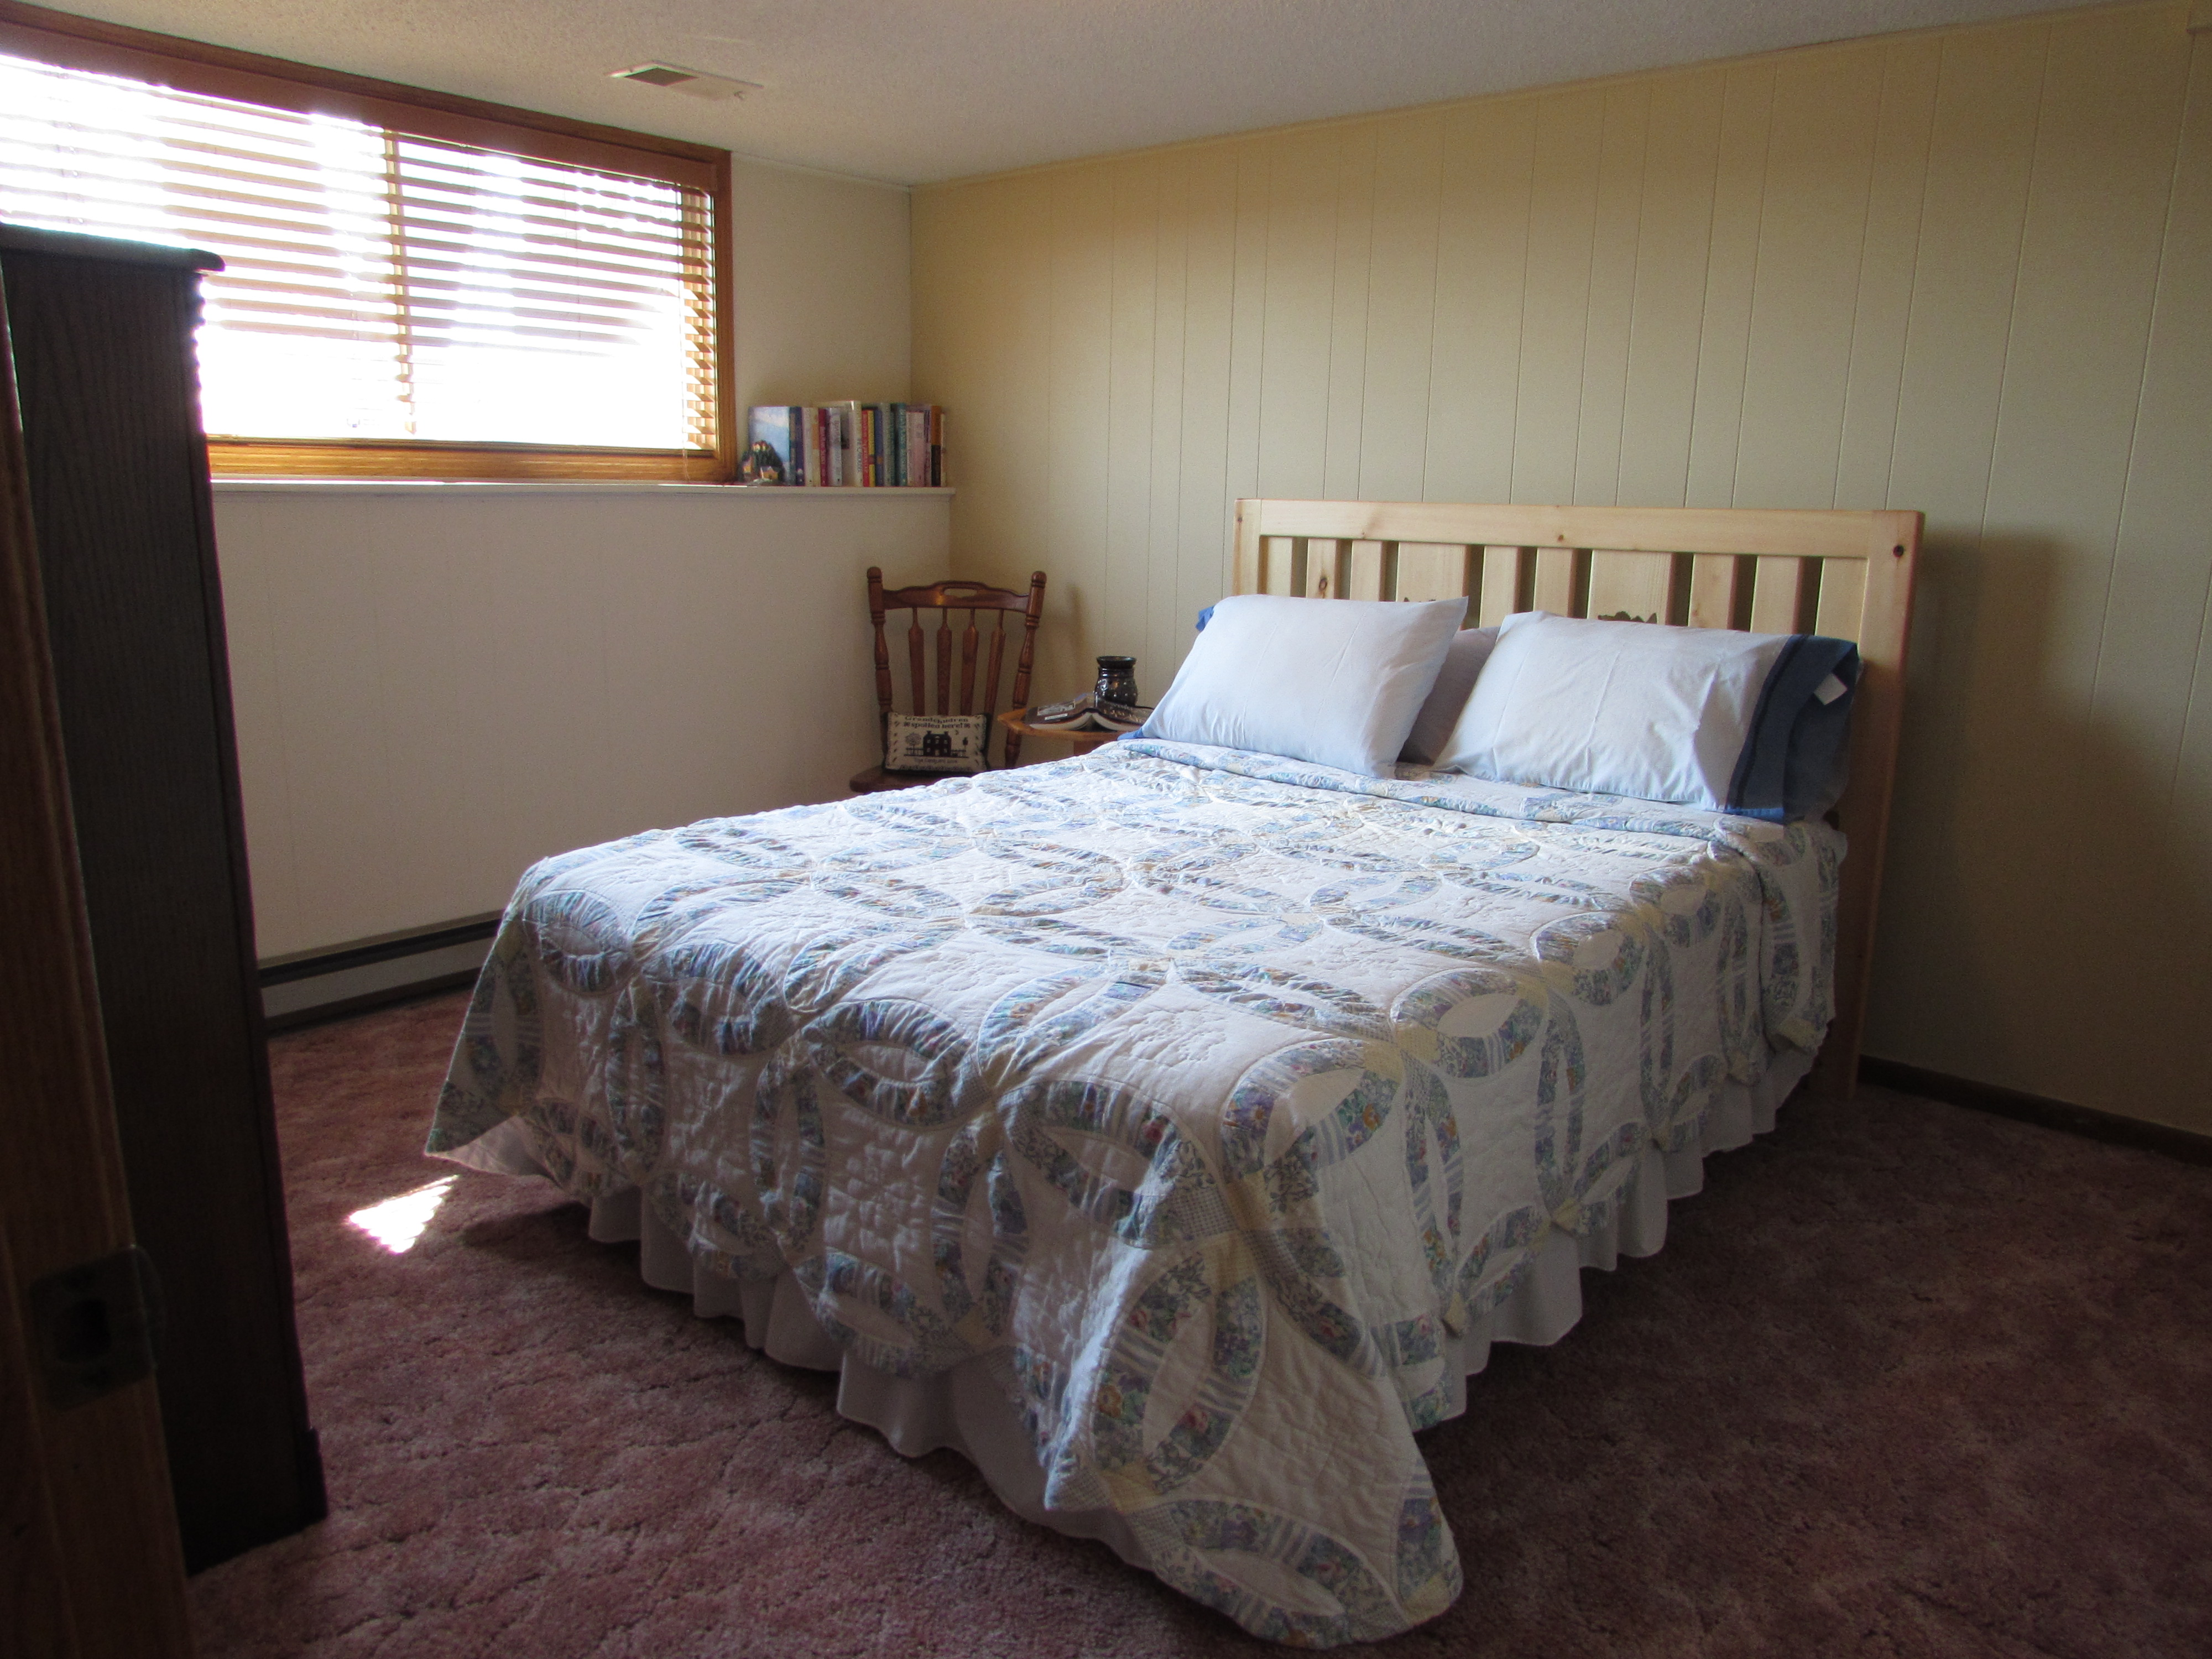 basement bed 2 after.JPG